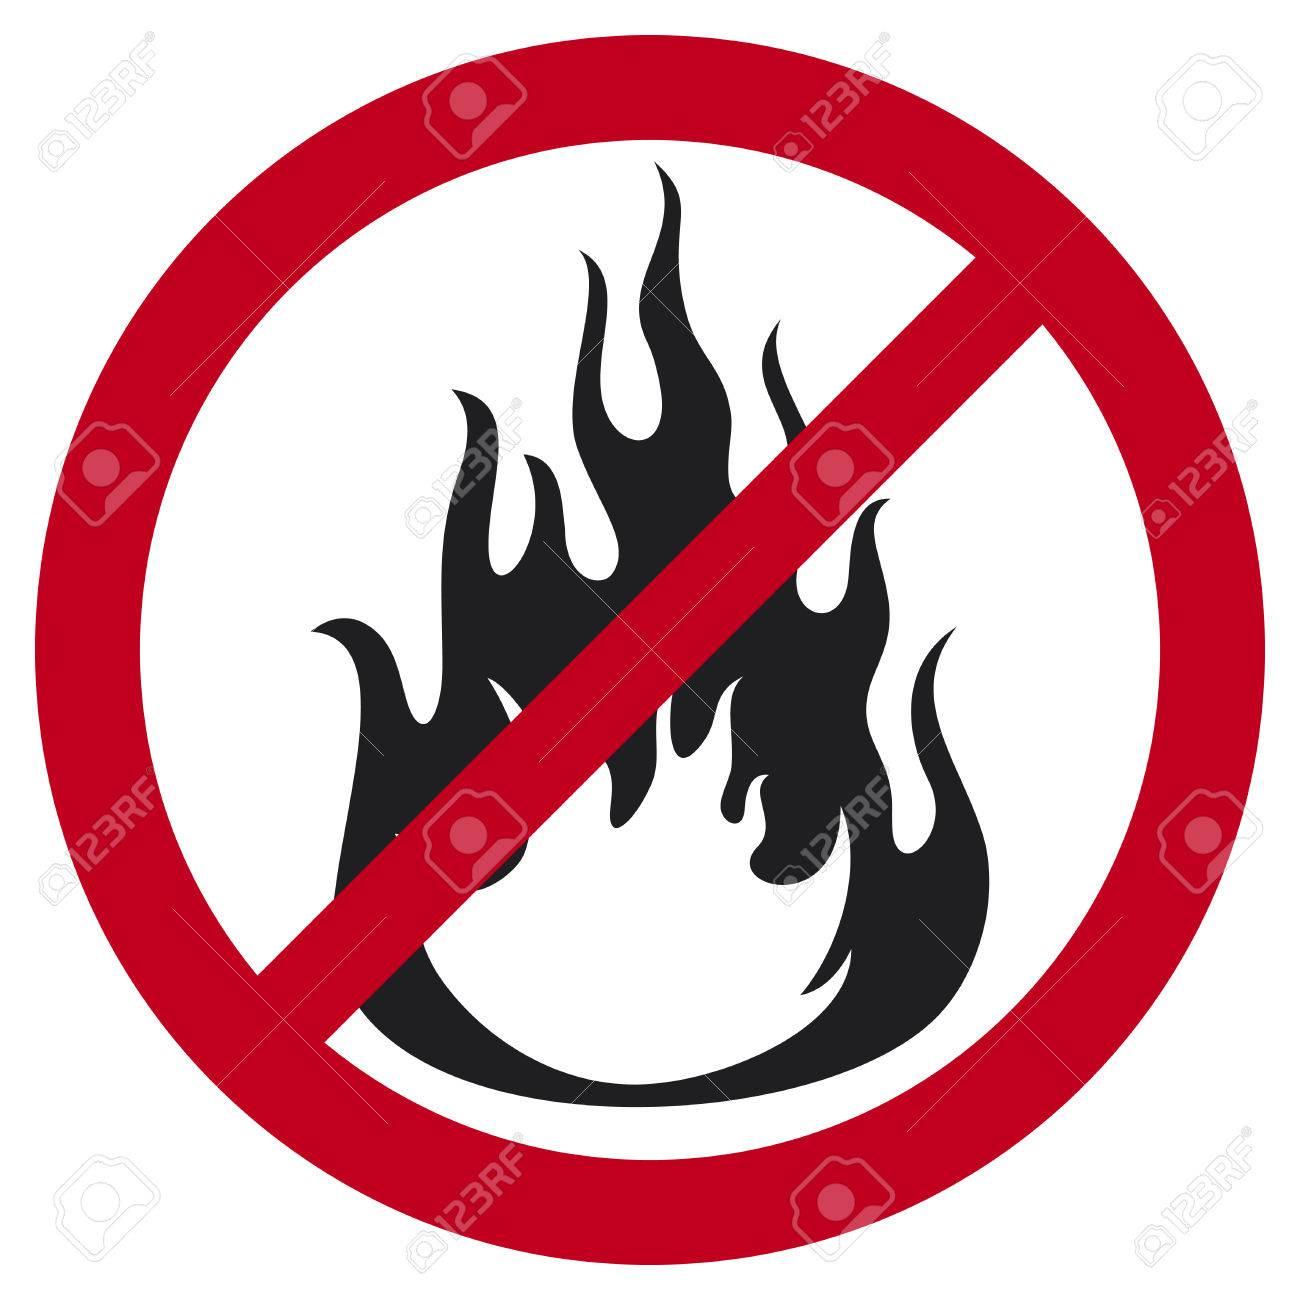 No fire sign no fire icon royalty free cliparts vectors and no fire sign no fire icon stock vector 27504297 buycottarizona